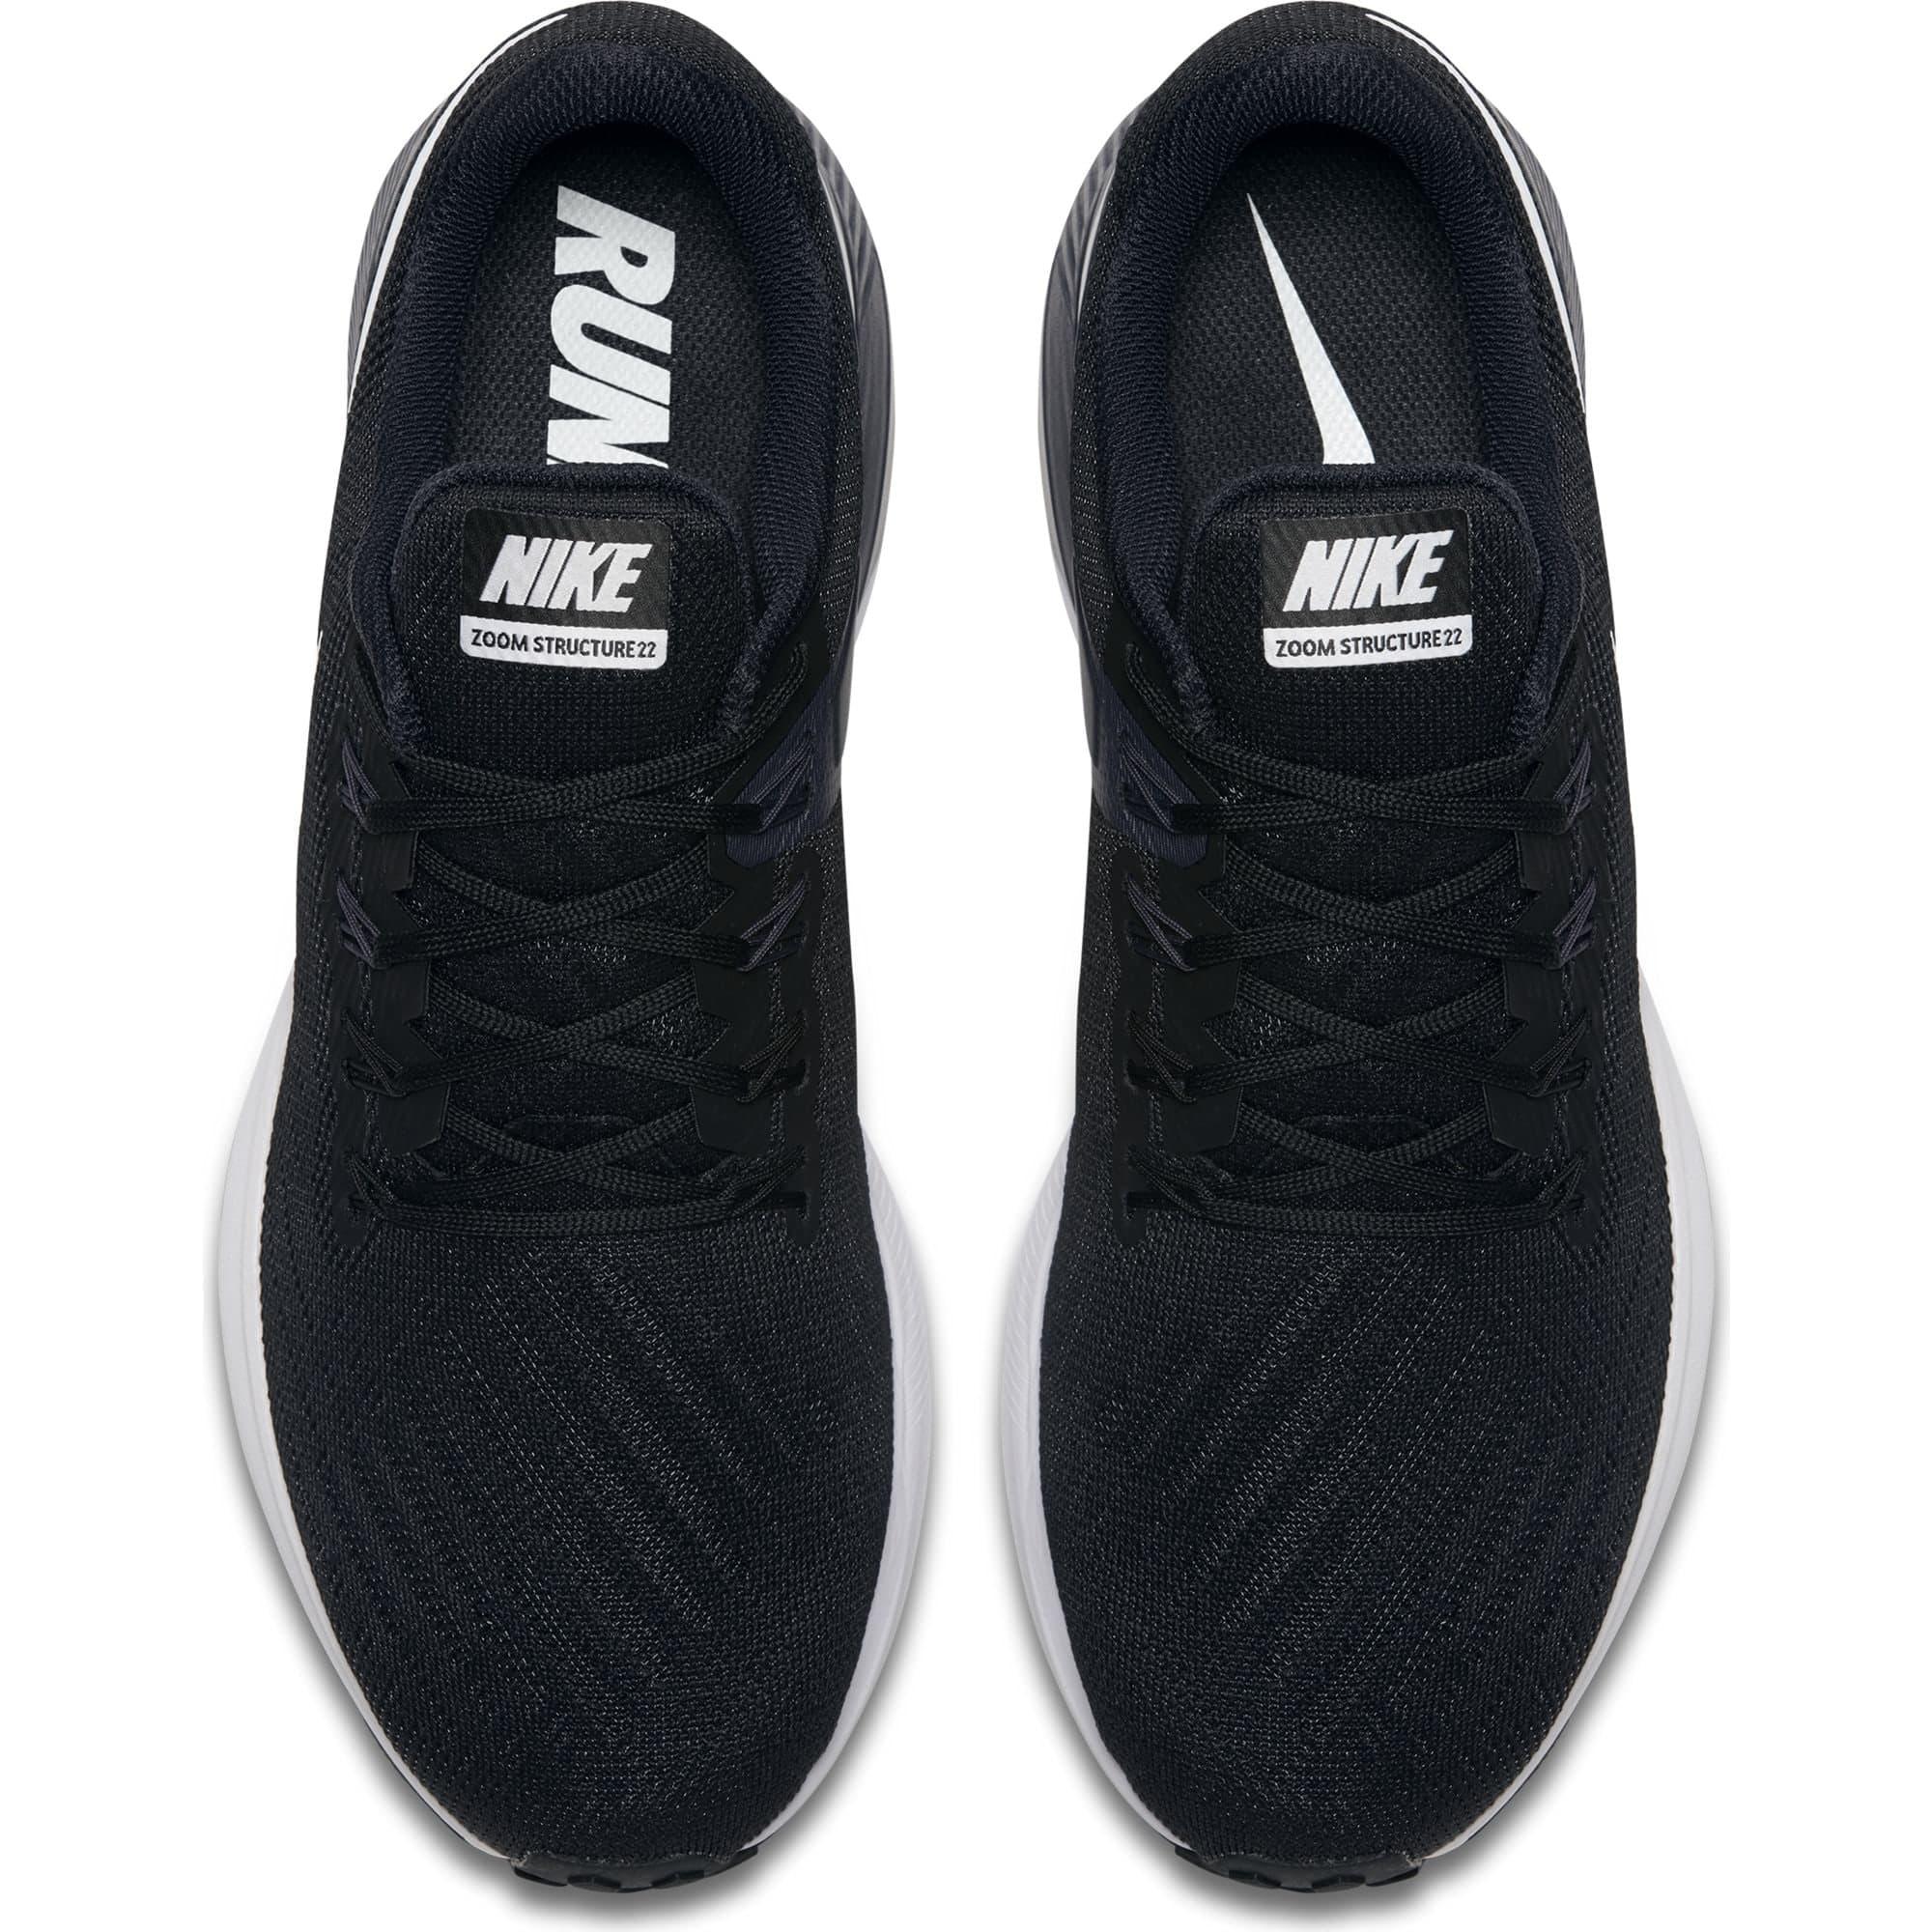 Paras hinta Nike Air Zoom Structure 18 (Miesten) | Katso